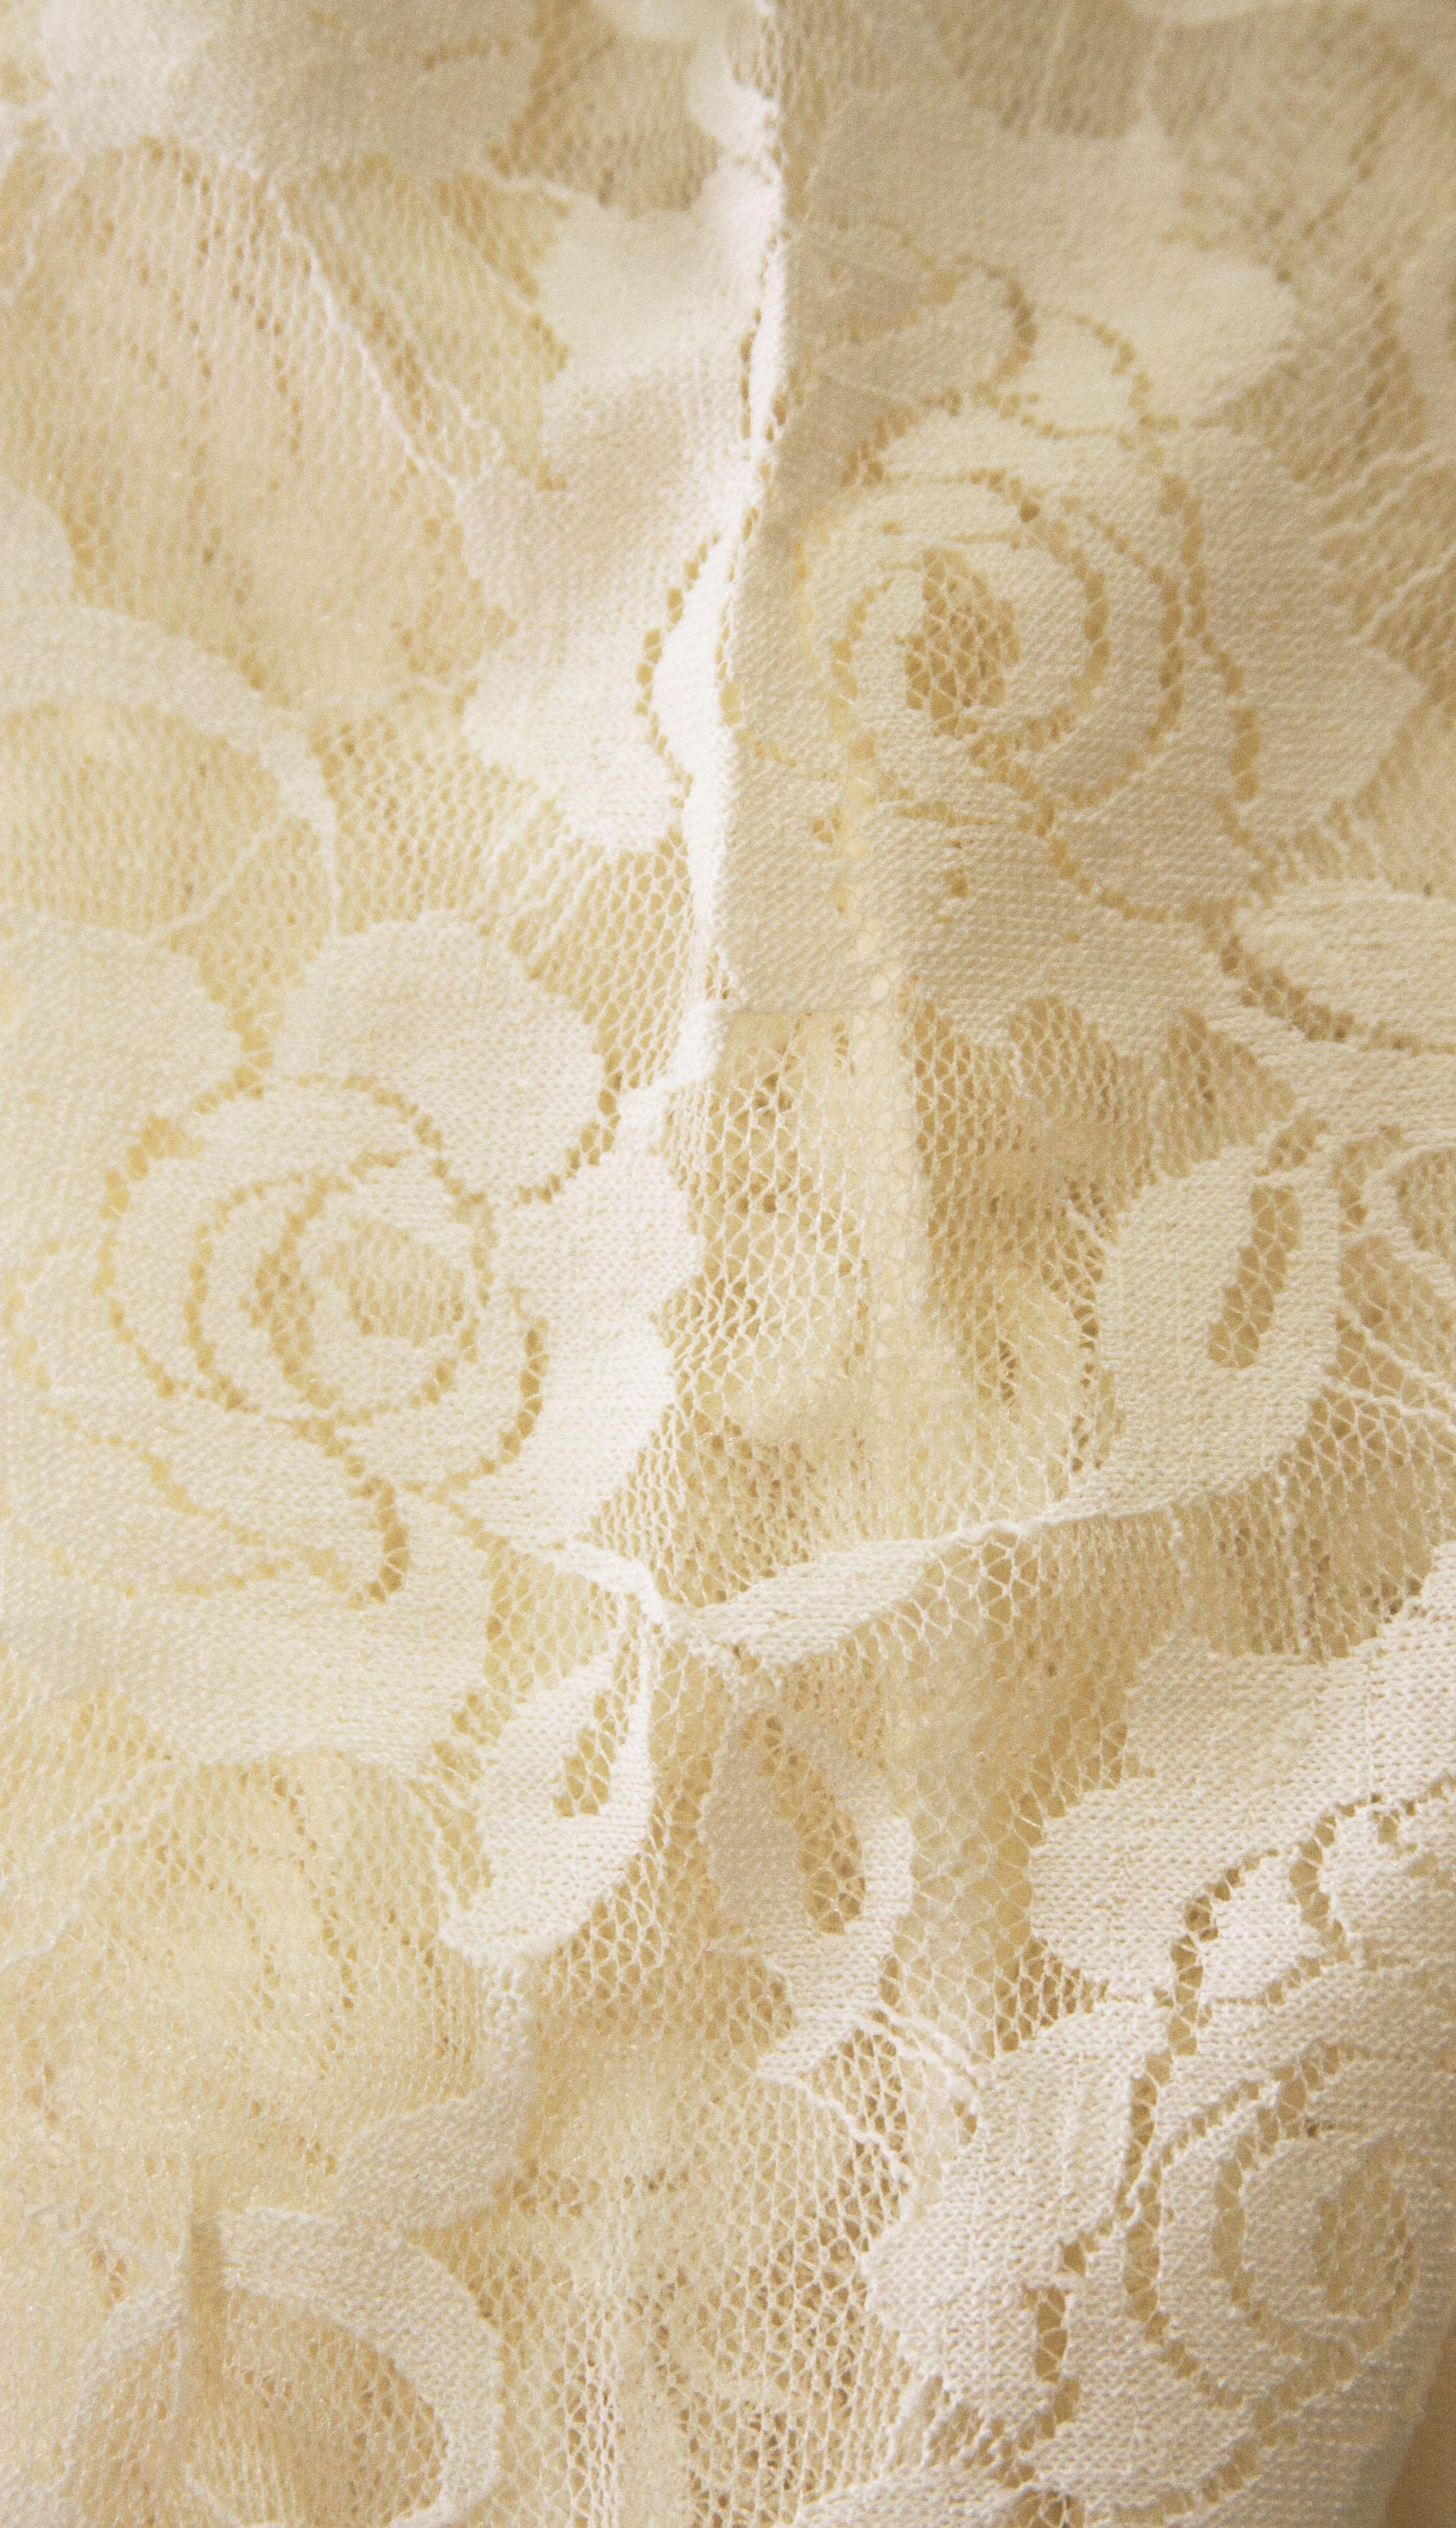 d1a7e6931f5 ... Cream Floral Lace Leggings